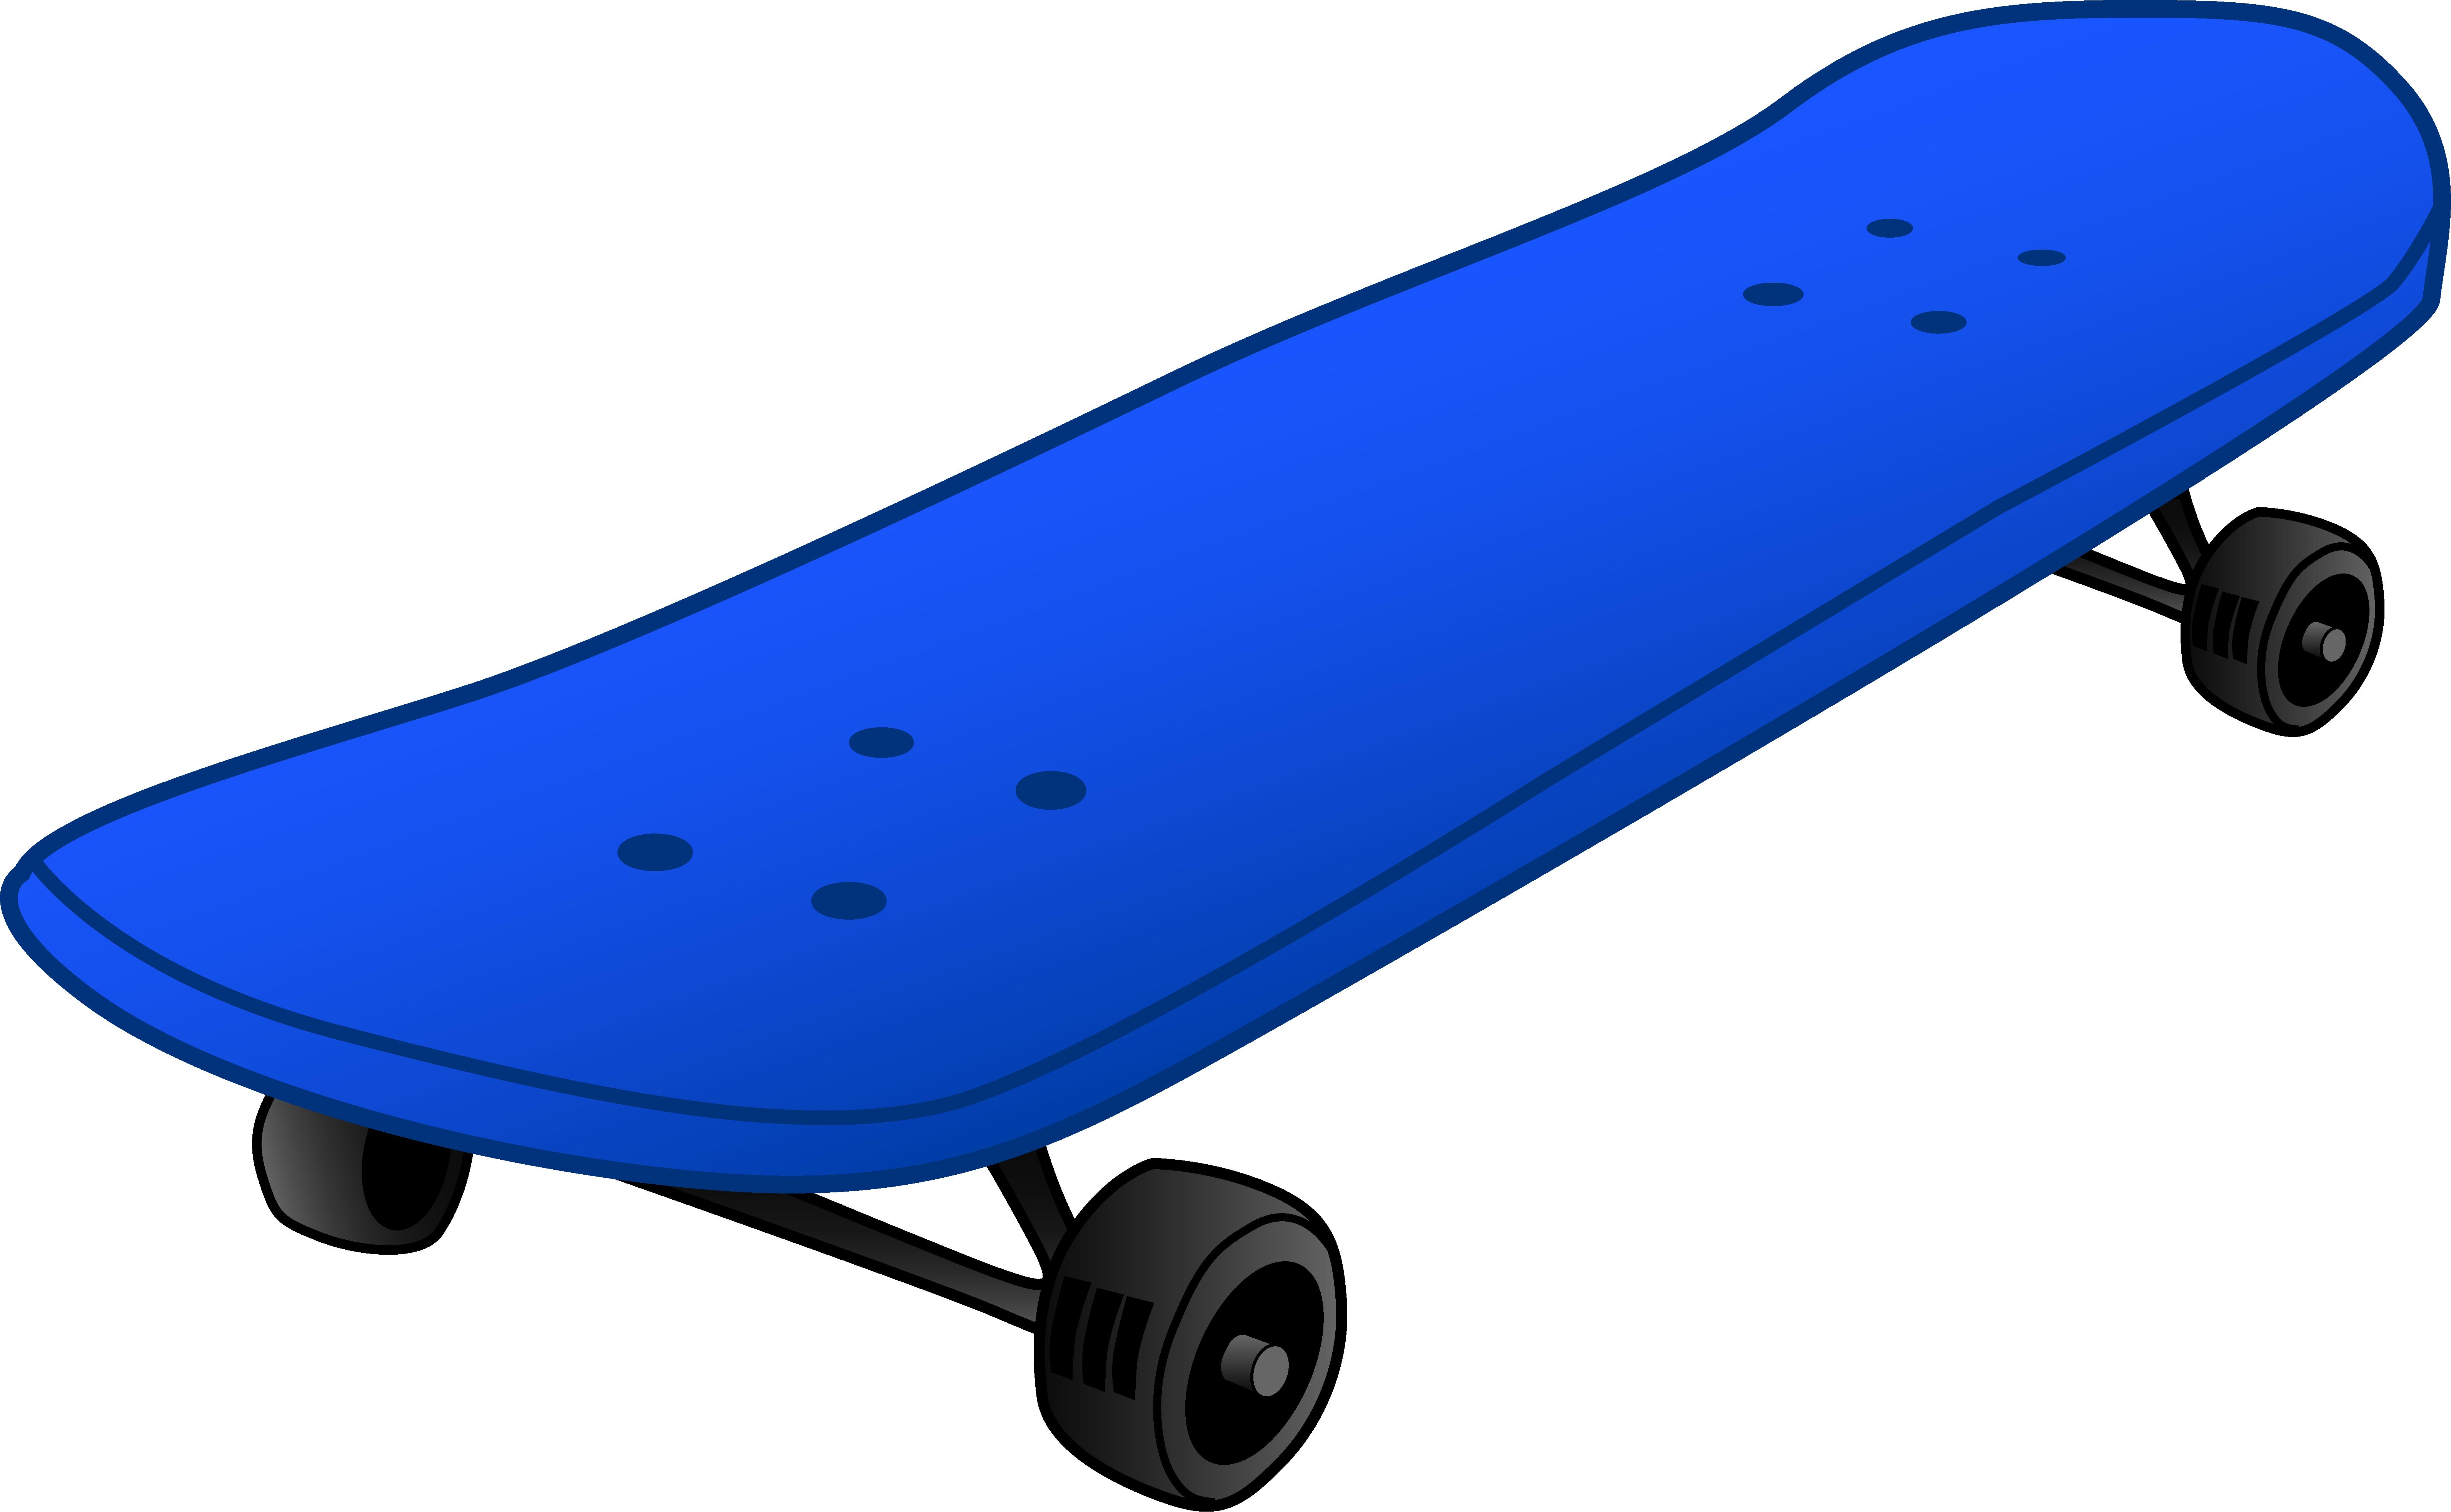 Skateboard Clipart #1